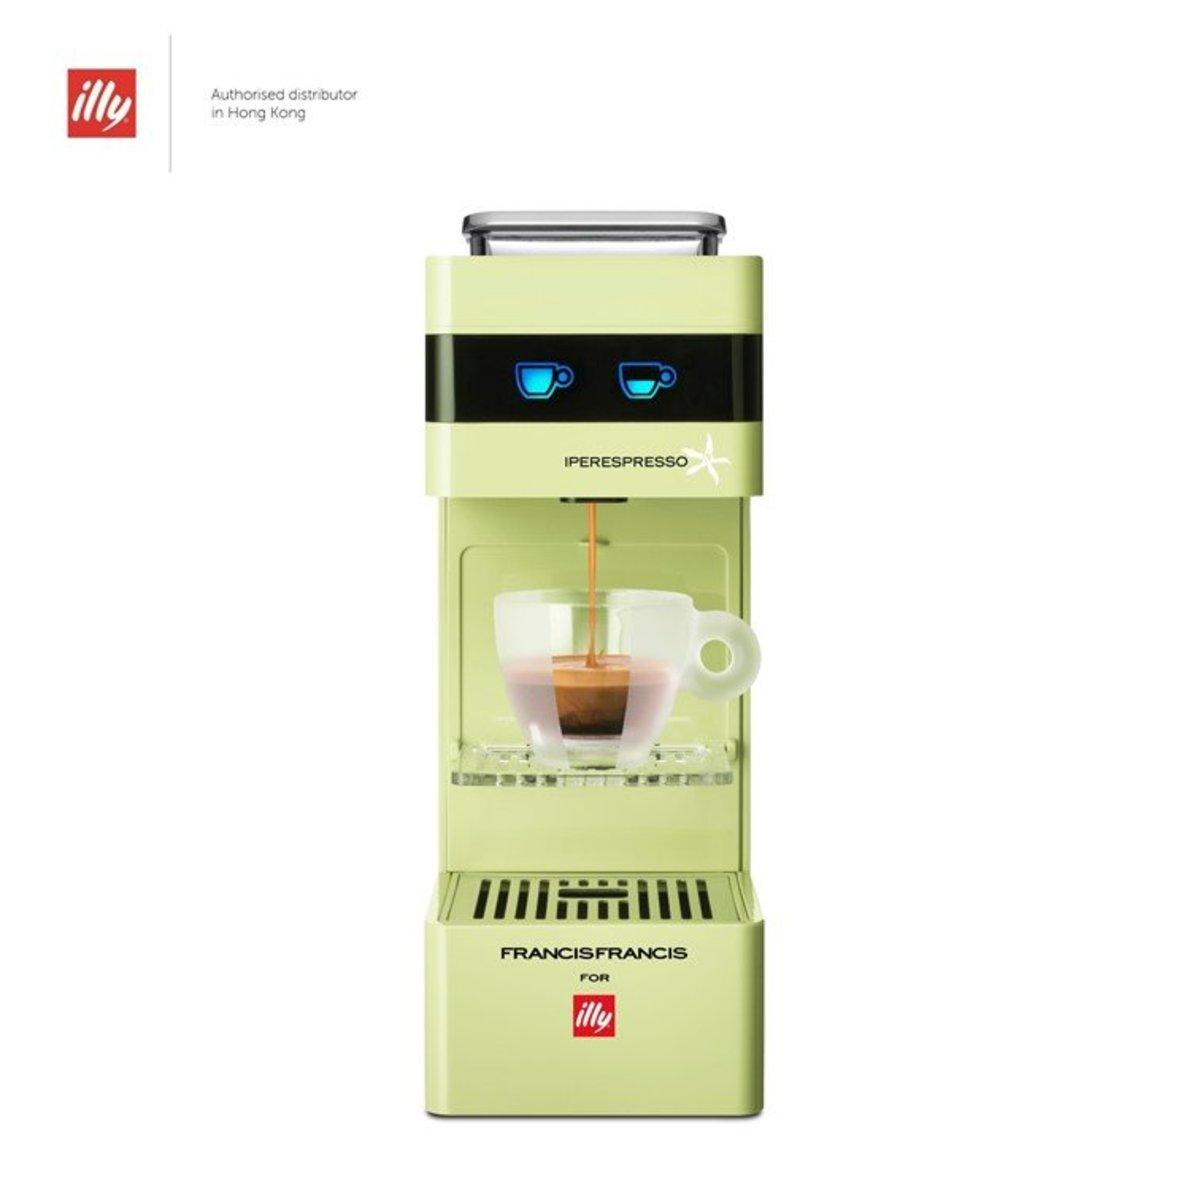 Y3A Iperespresso Home Espresso Capsule Machine - Lime